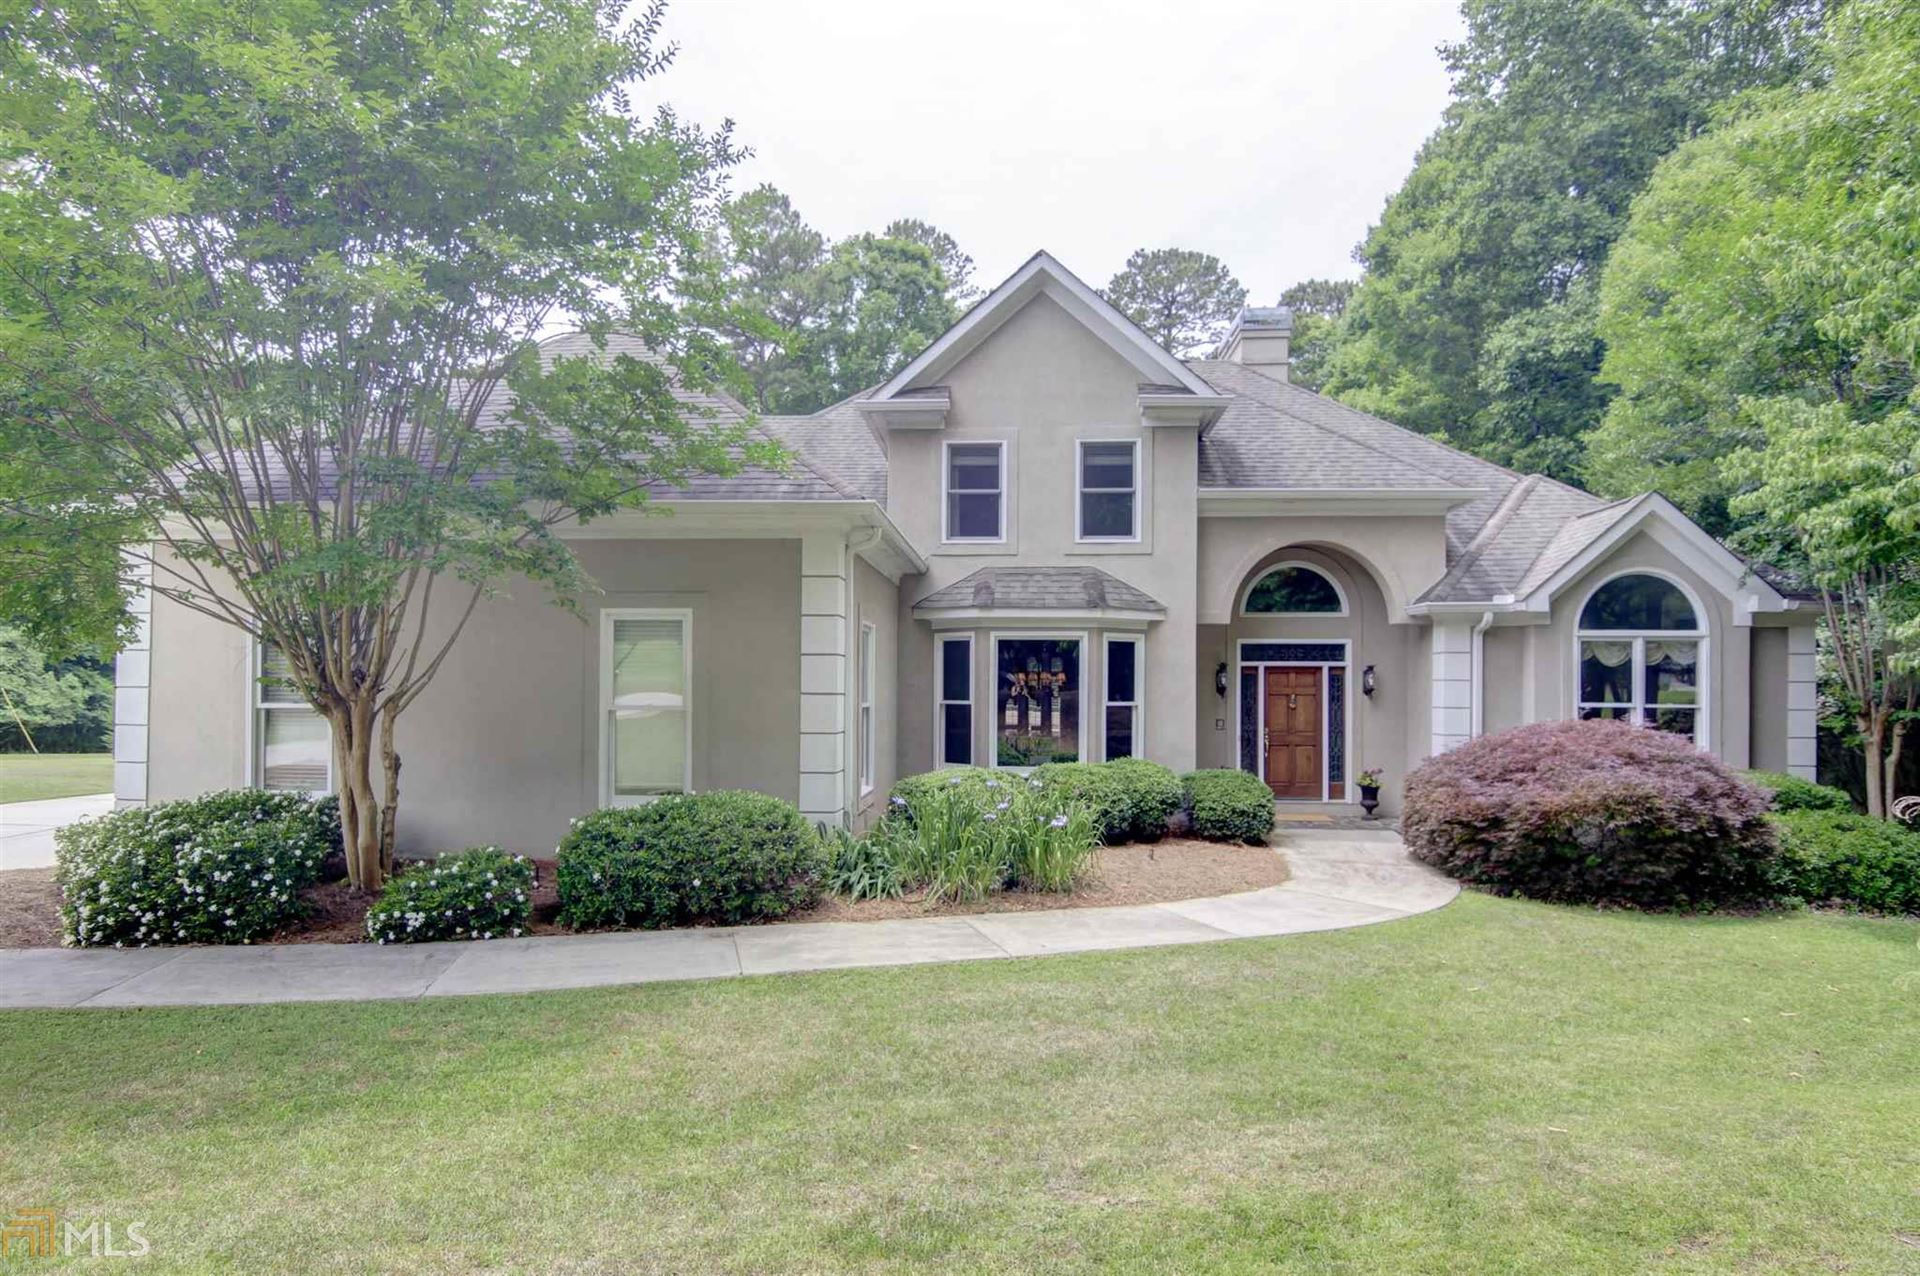 345 Broadmoor Dr, Fayetteville, GA 30215 - #: 8991187